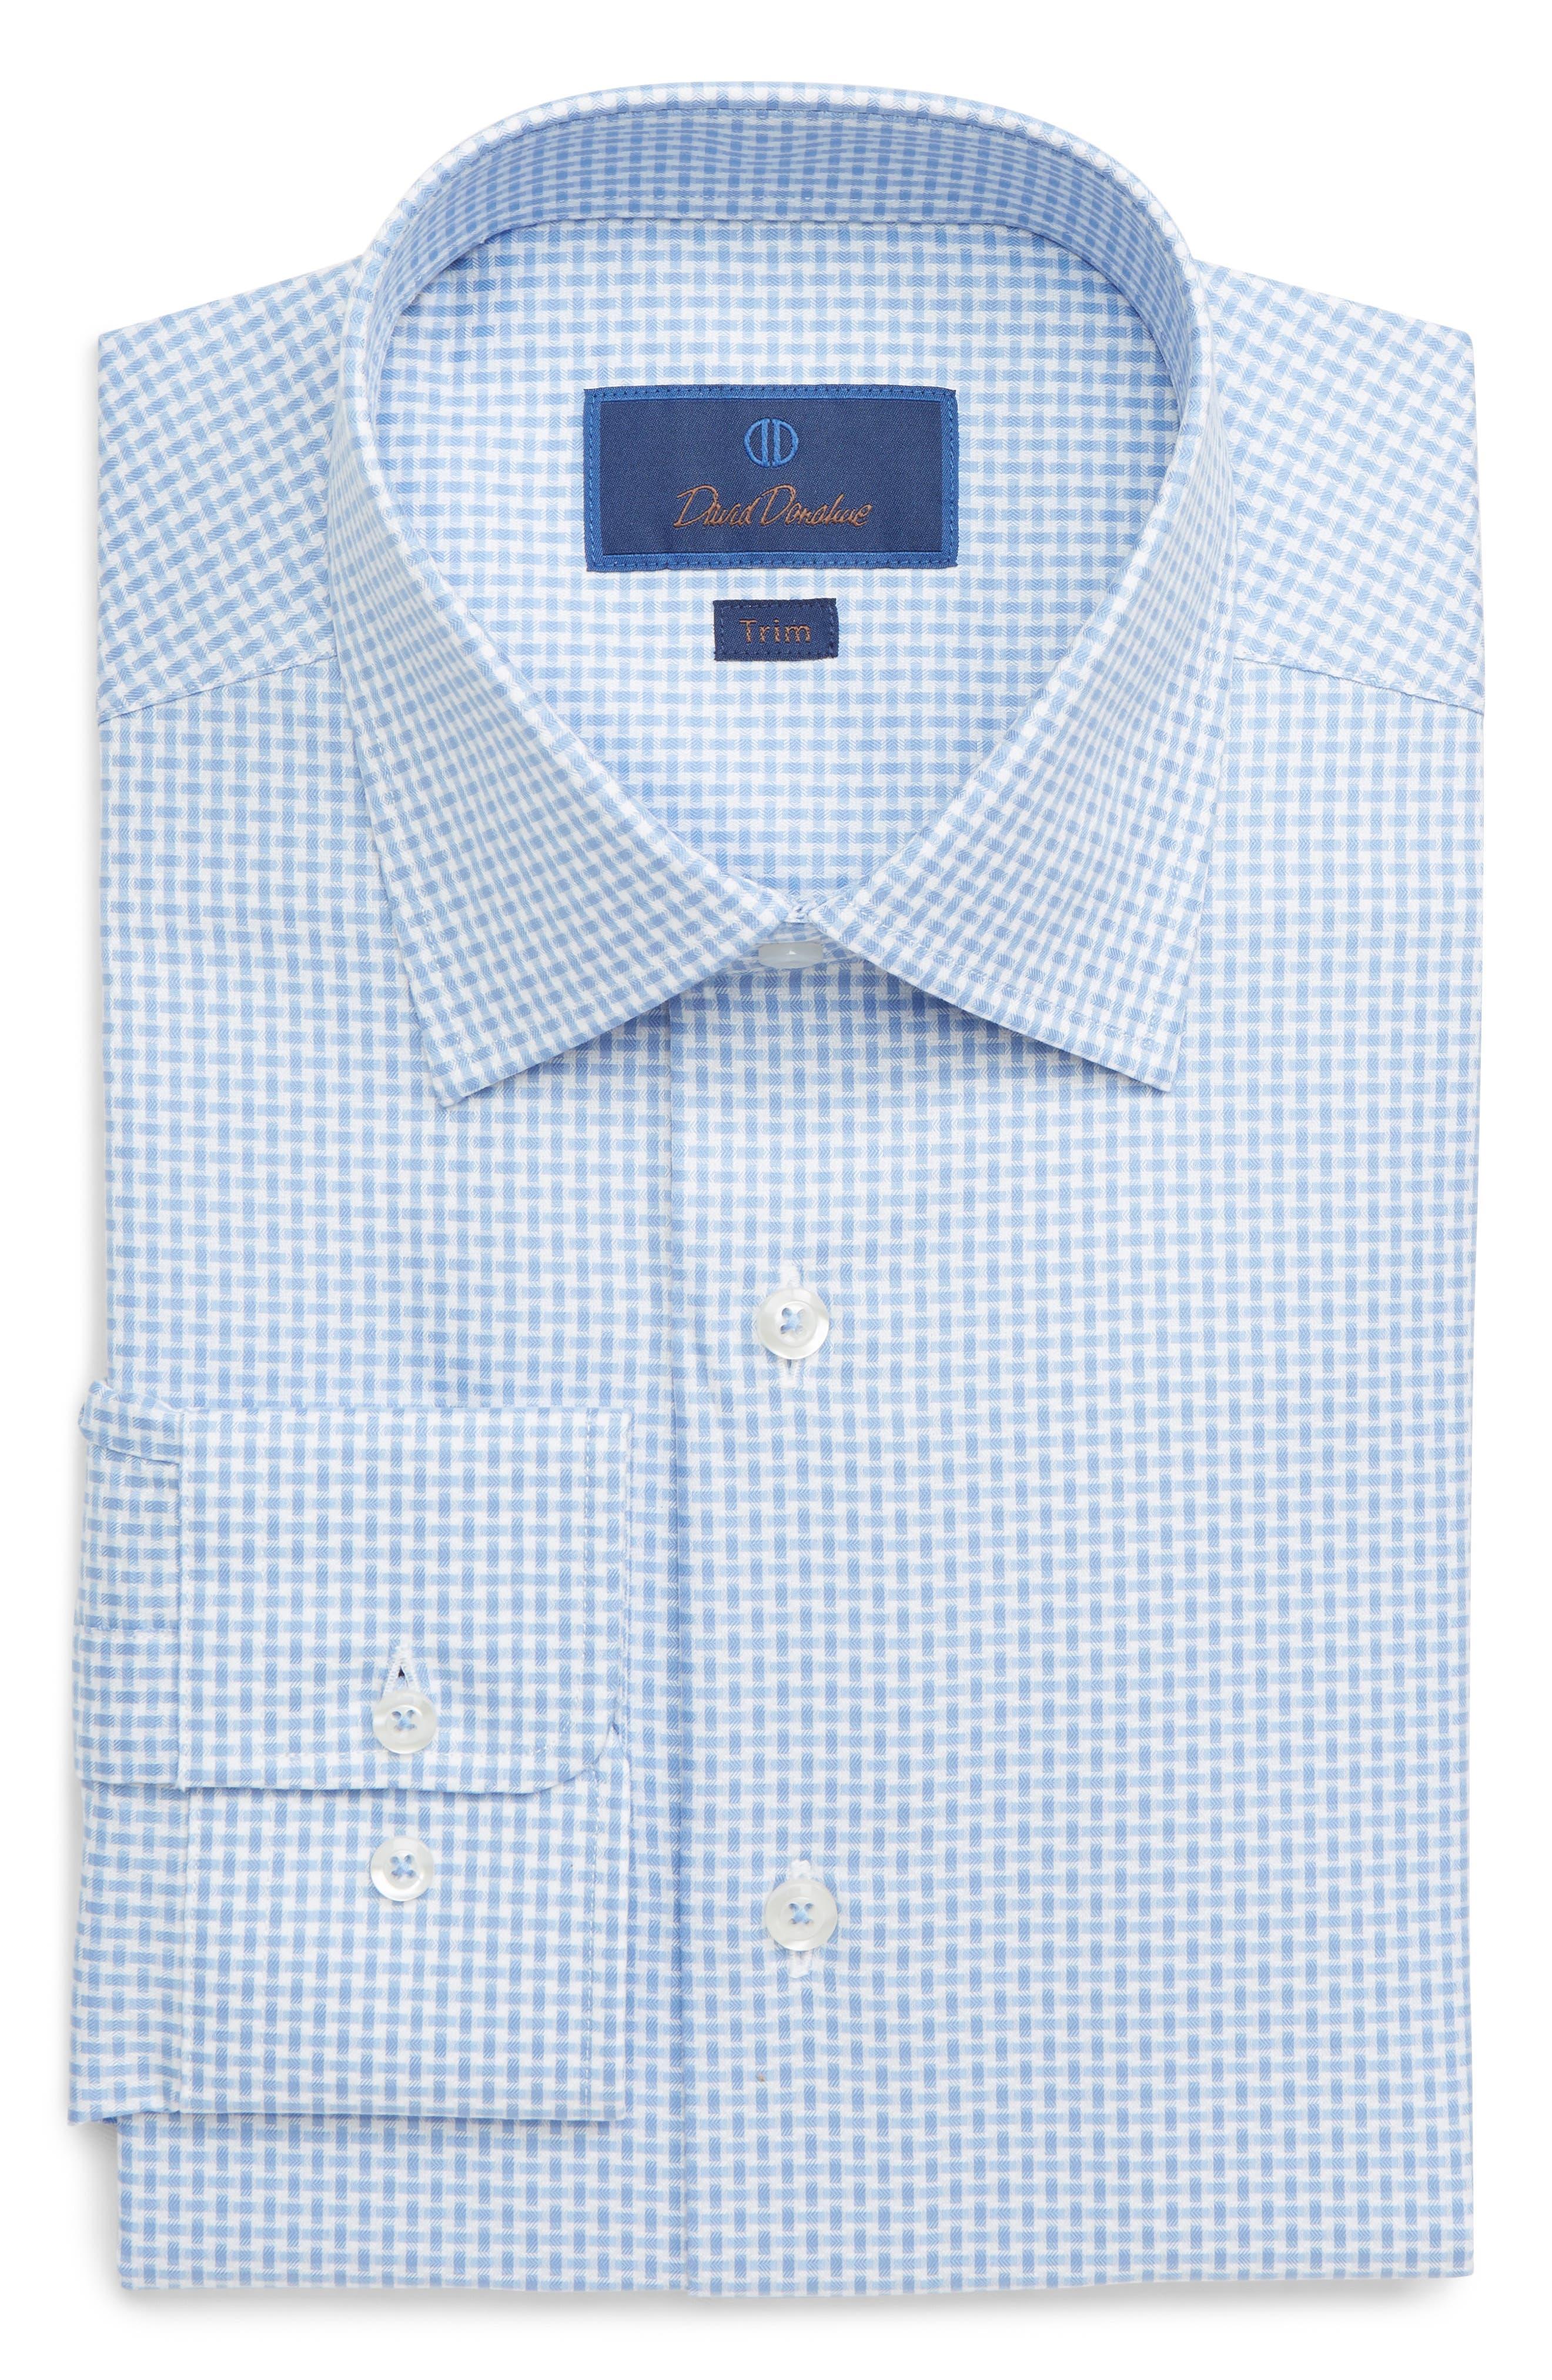 DAVID DONAHUE, Trim Fit Print Dress Shirt, Main thumbnail 1, color, BLUE